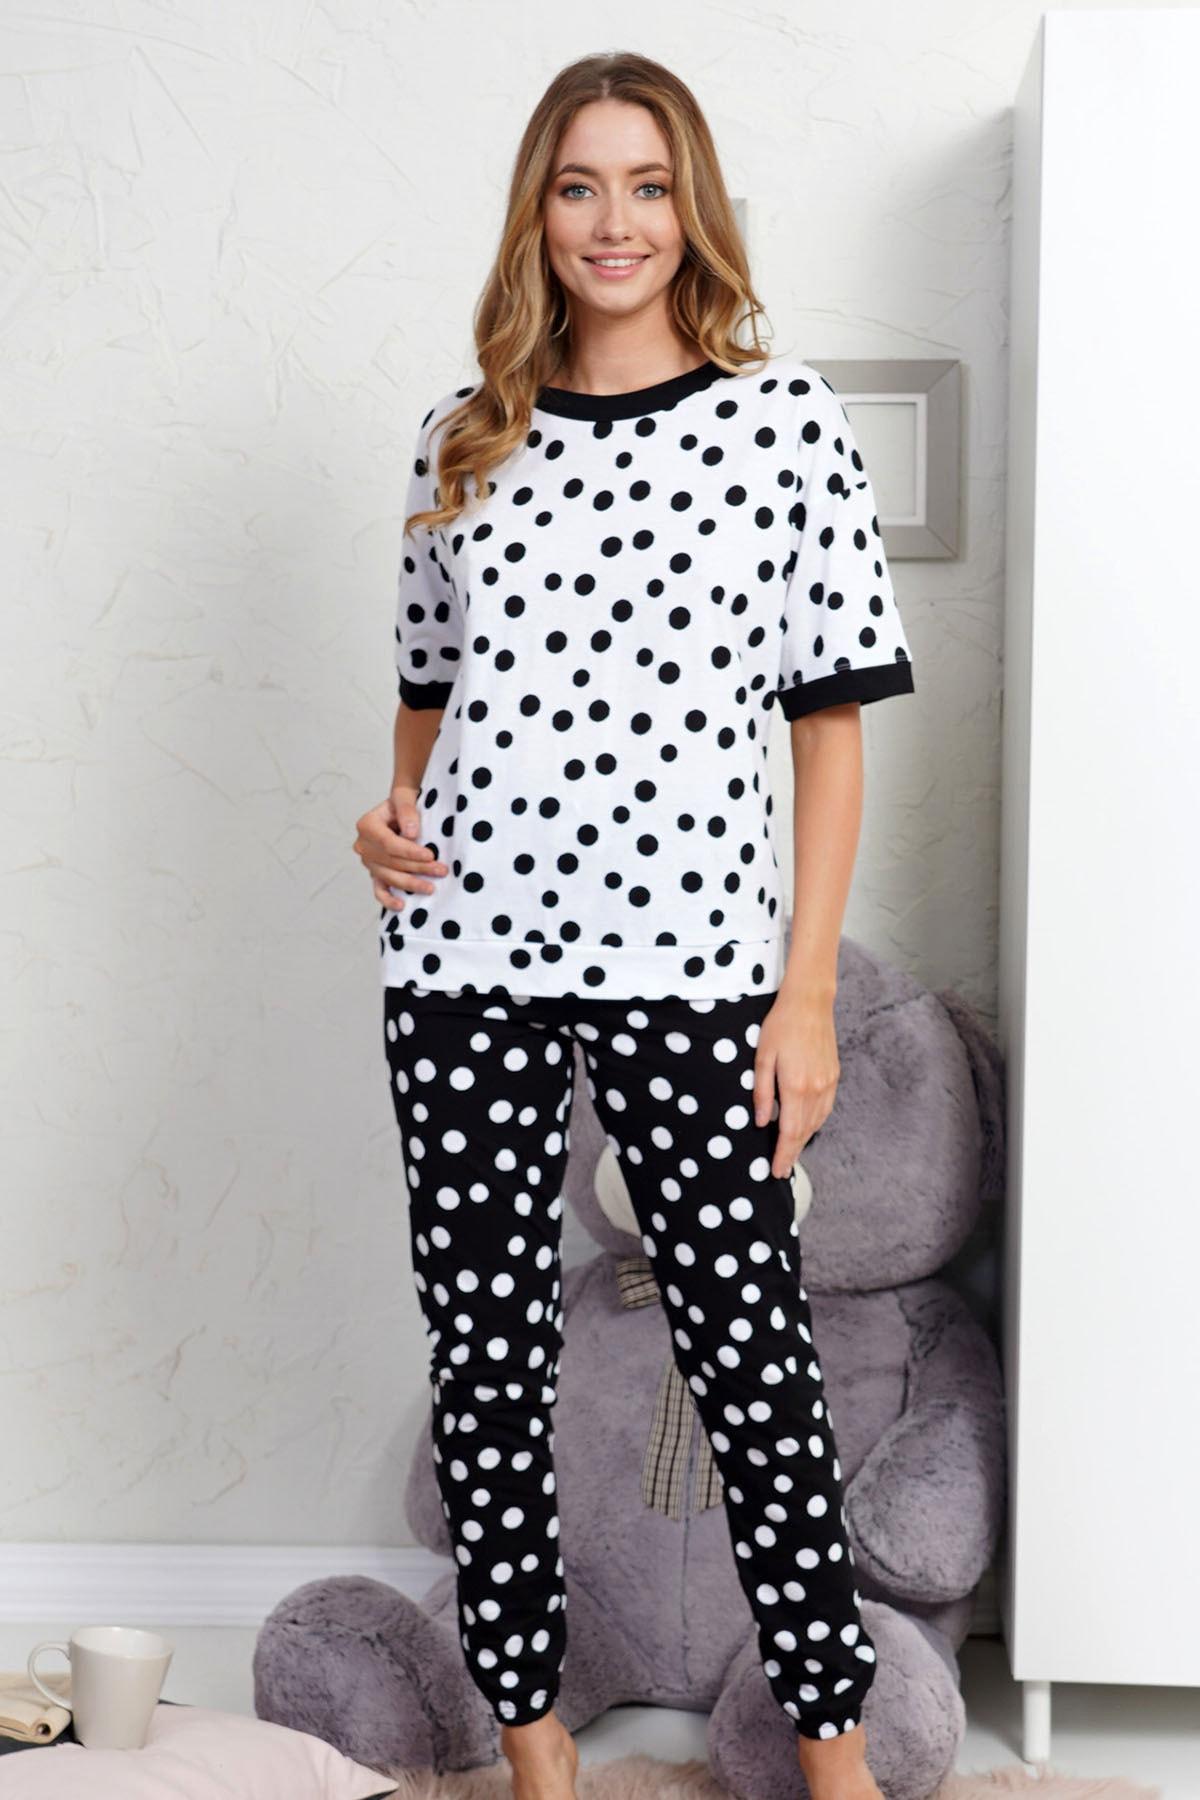 VİENETTA Pamuklu Düşük Omuzlu Kısa Kol Pijama Takım 2